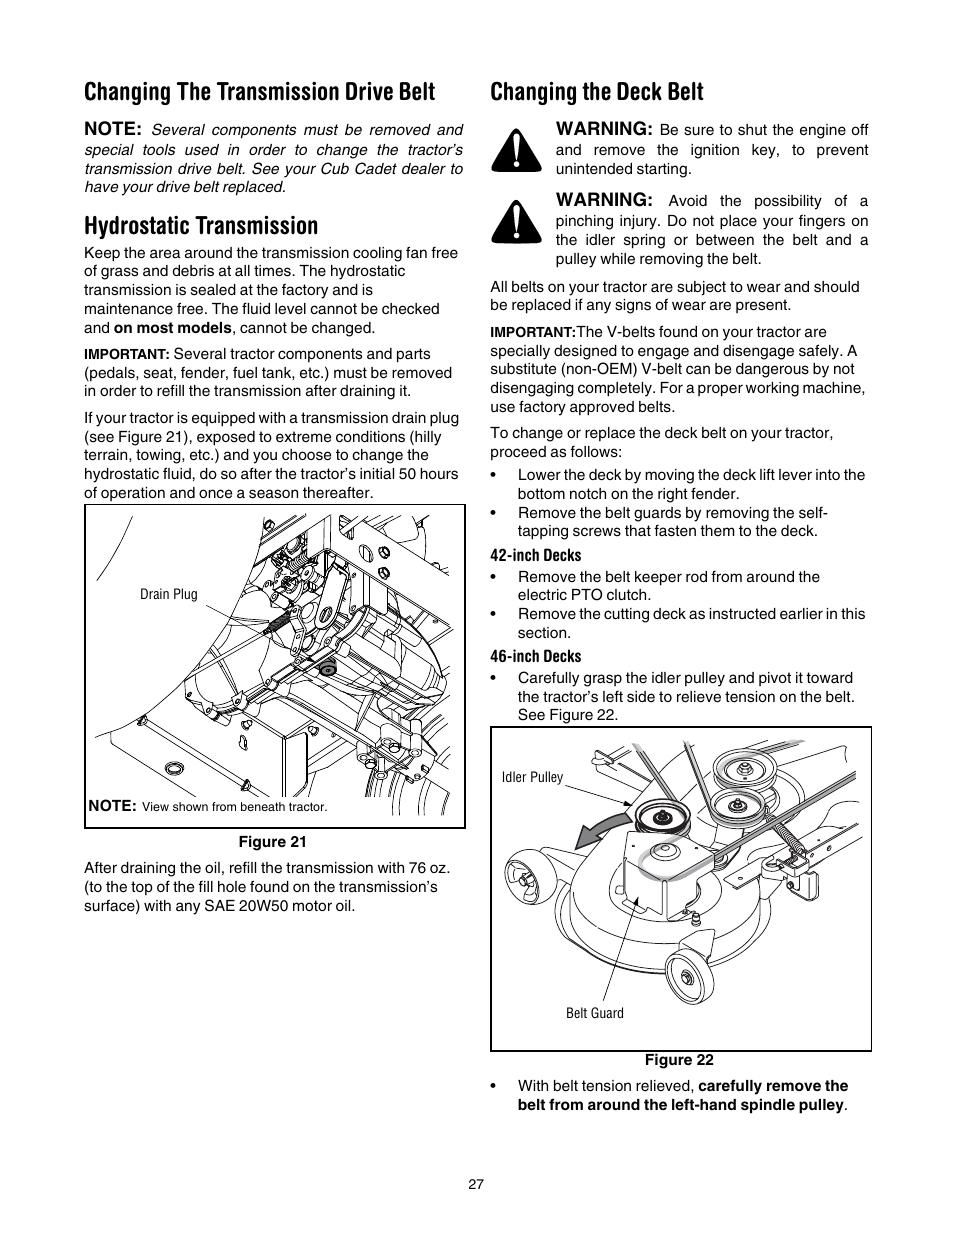 Changing the transmission drive belt, Hydrostatic